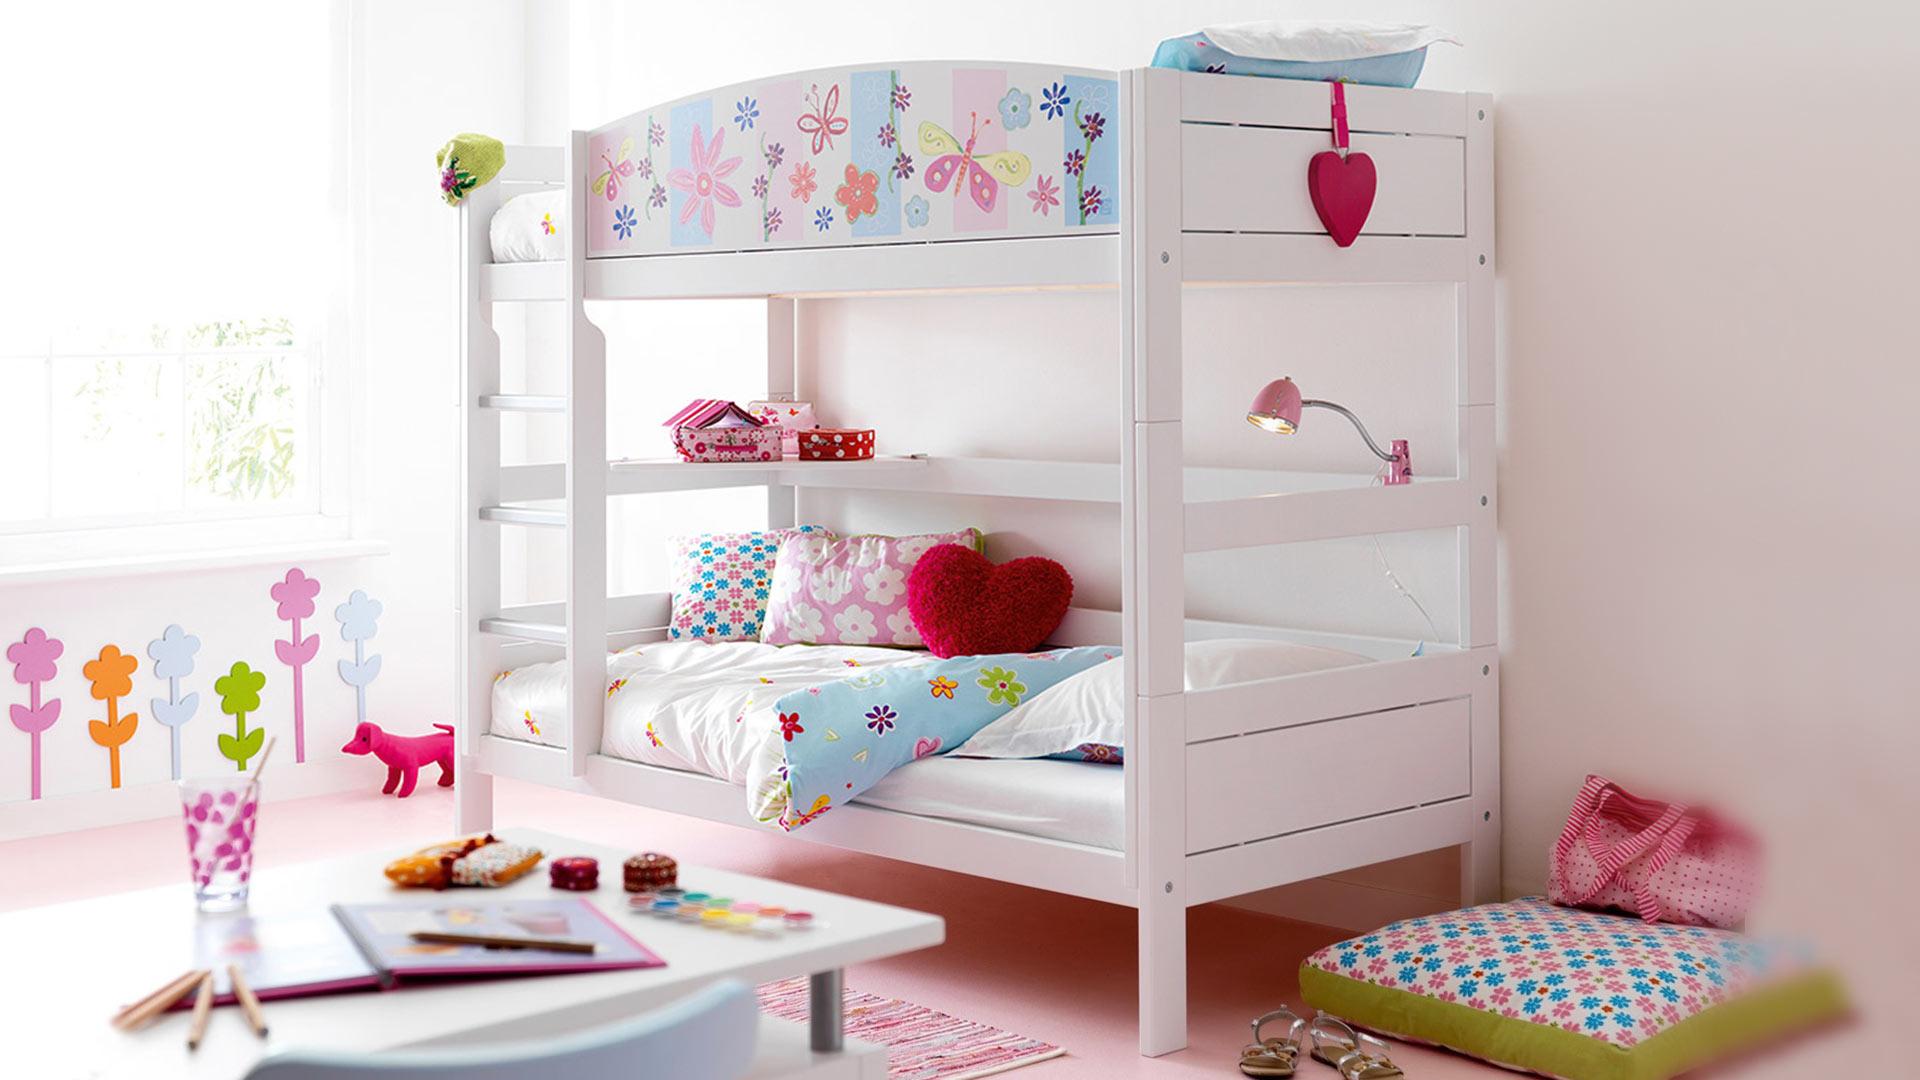 Etagenbett Gute Qualität : Relita etagenbett u eu emikeu cu c bett aus massiver buche online kaufen